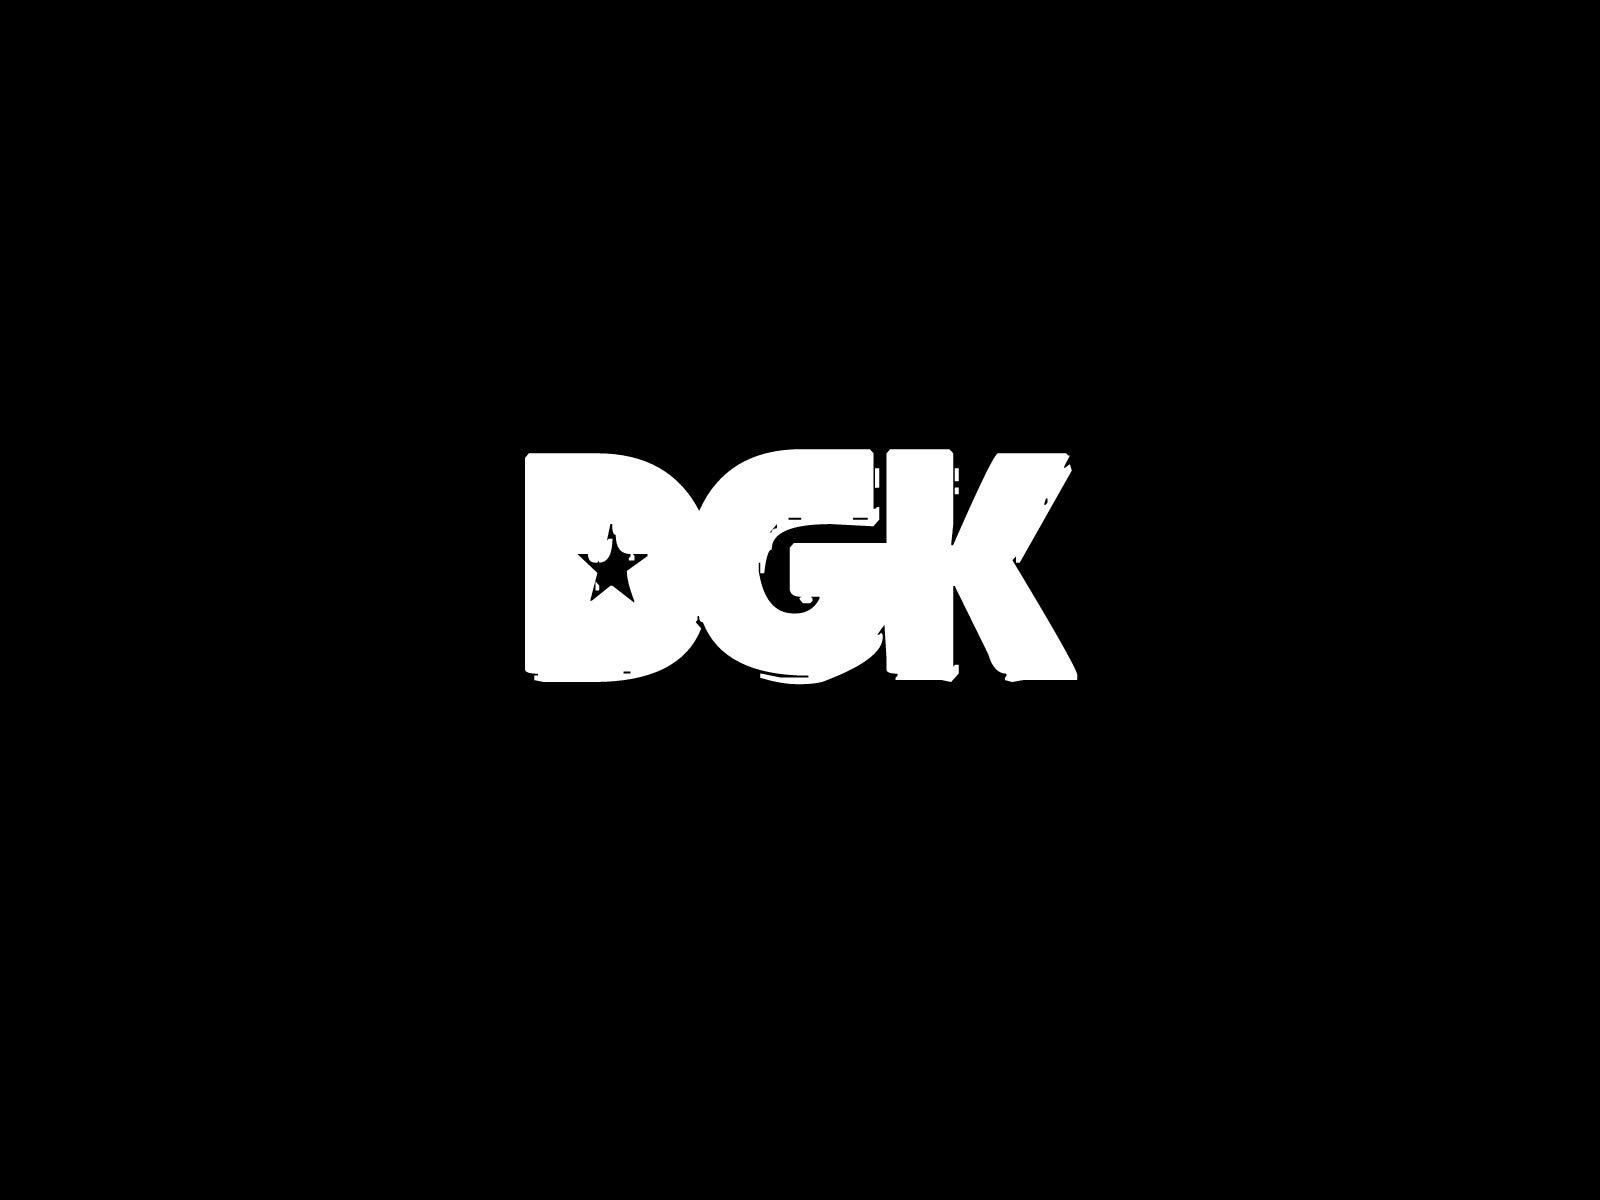 Awesome Logos Desktop Backgrounds DGK 4K Ultra HD 787680 1600x1200